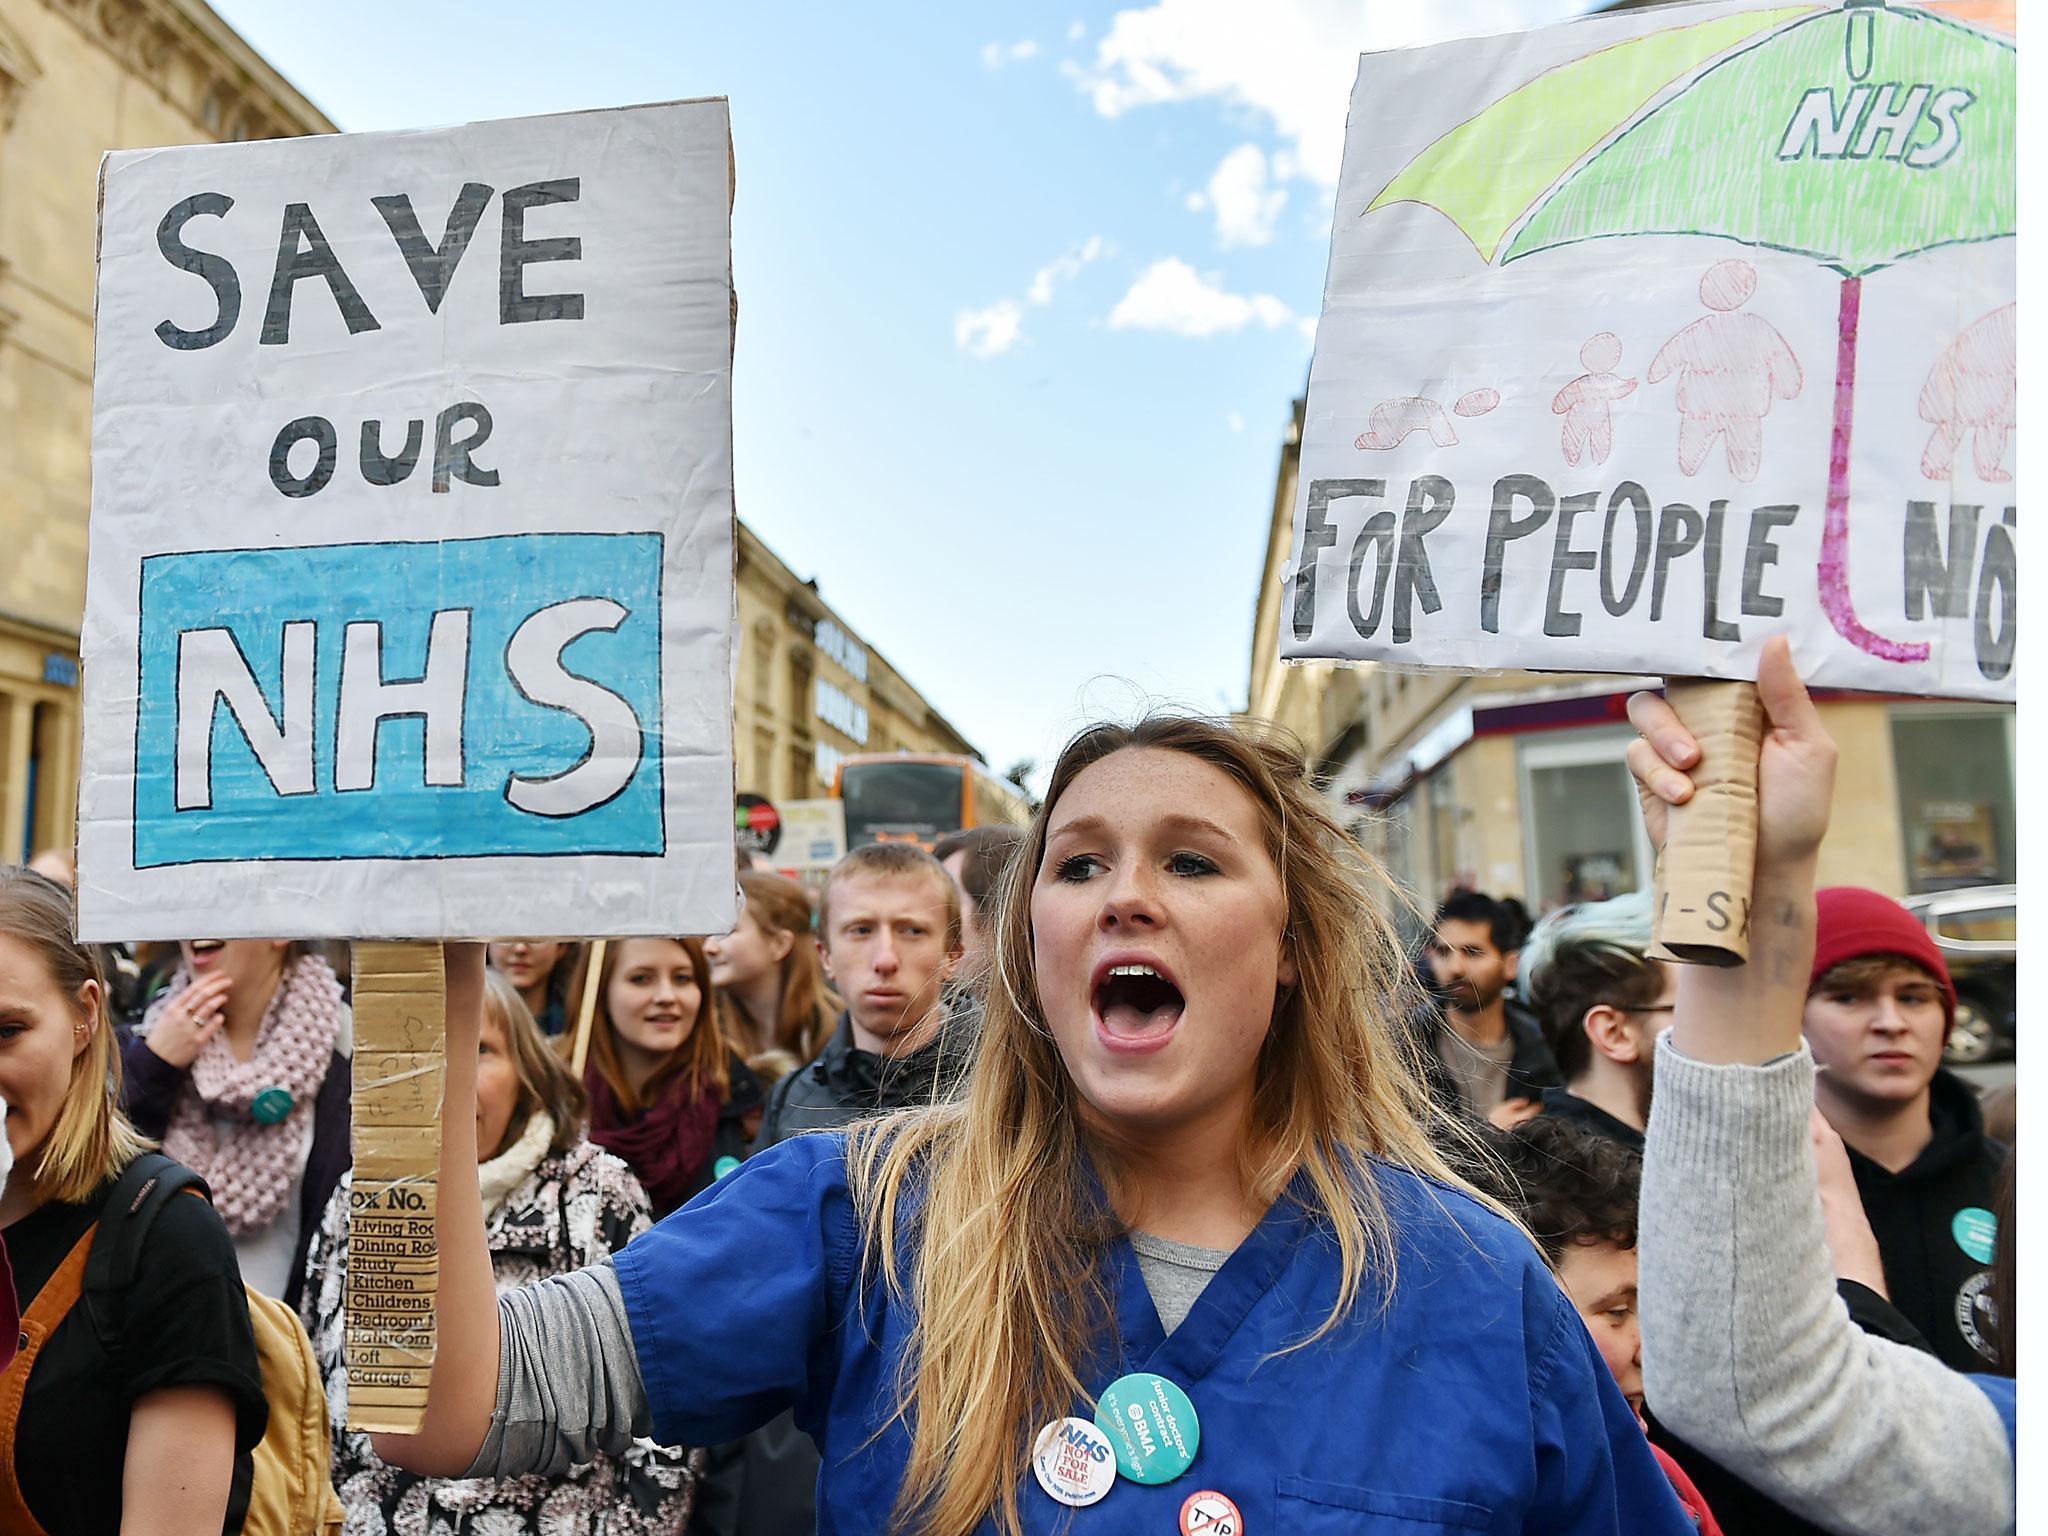 Morale crisis among NHS doctors 'puts patients at risk'